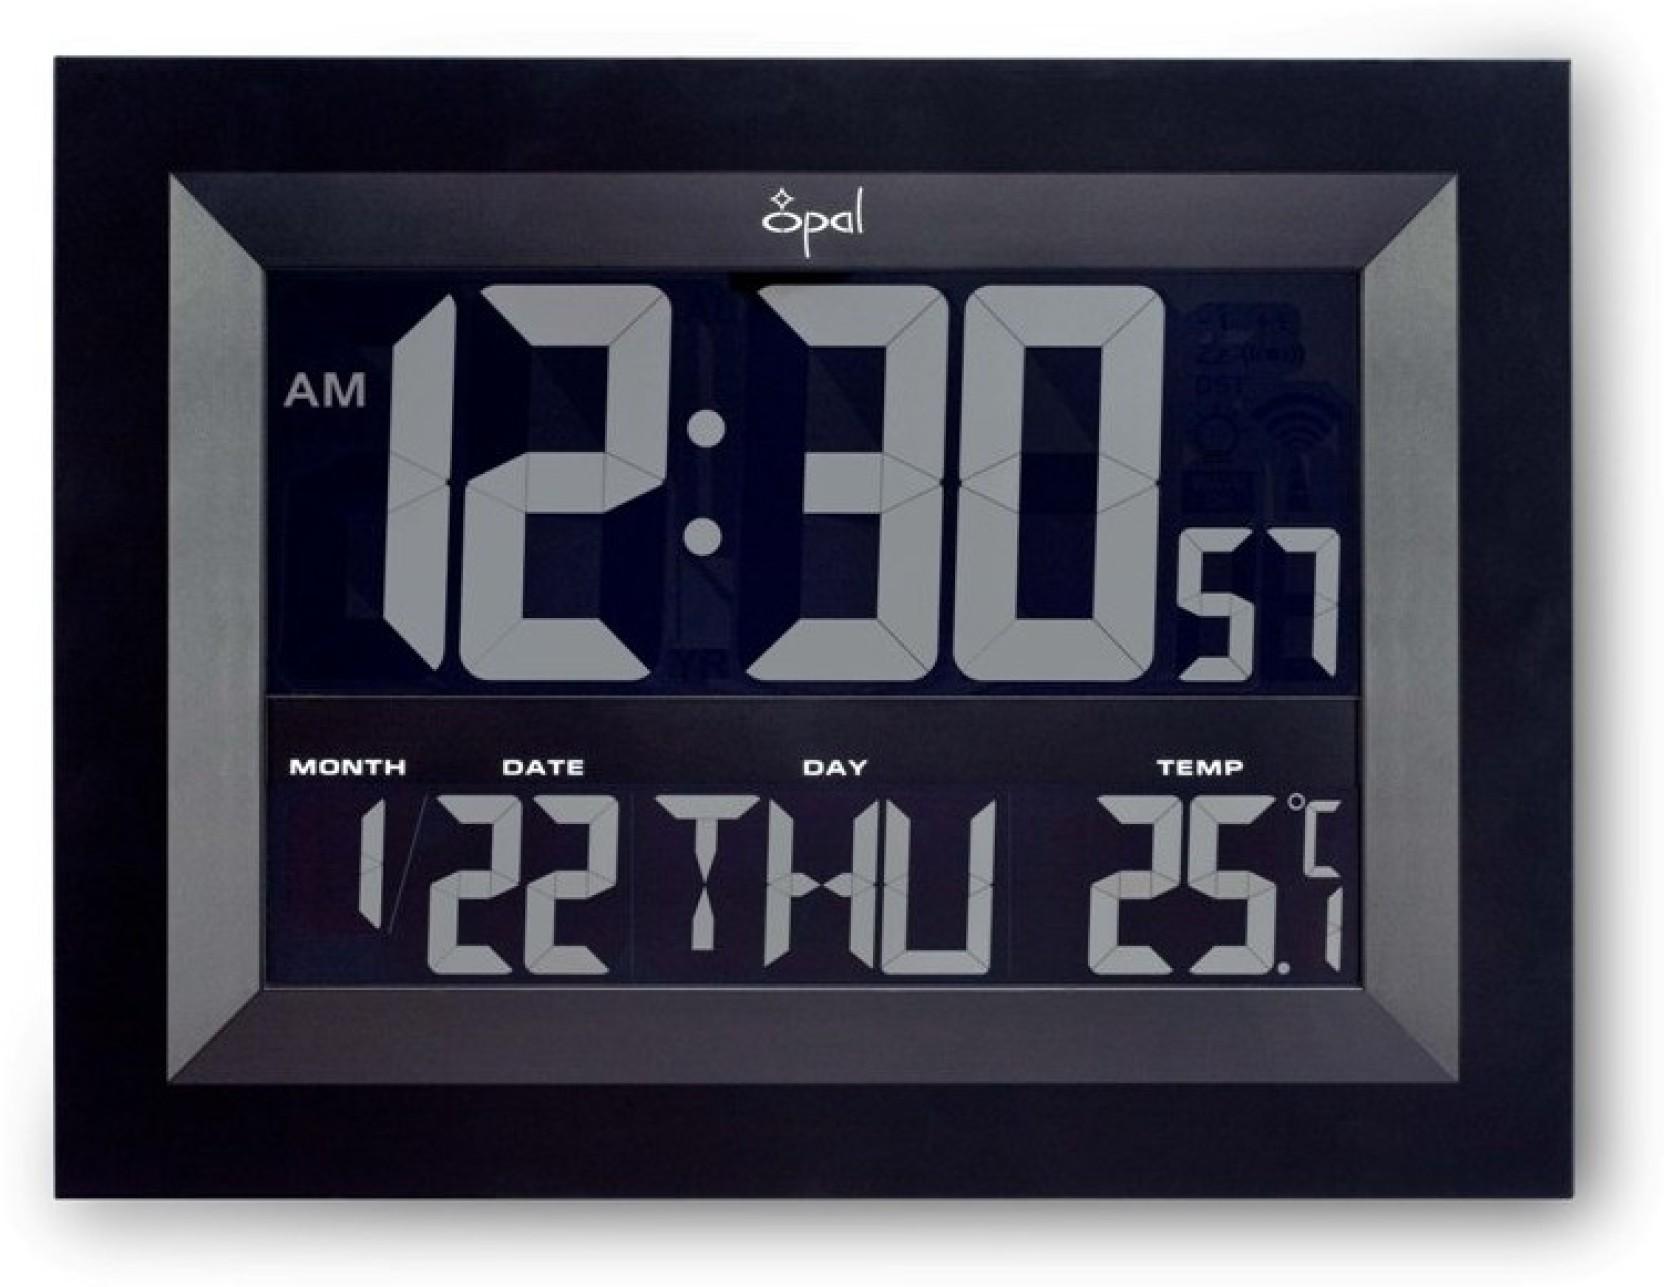 Opal Digital Wall Clock Price in India - Buy Opal Digital Wall Clock online at Flipkart.com